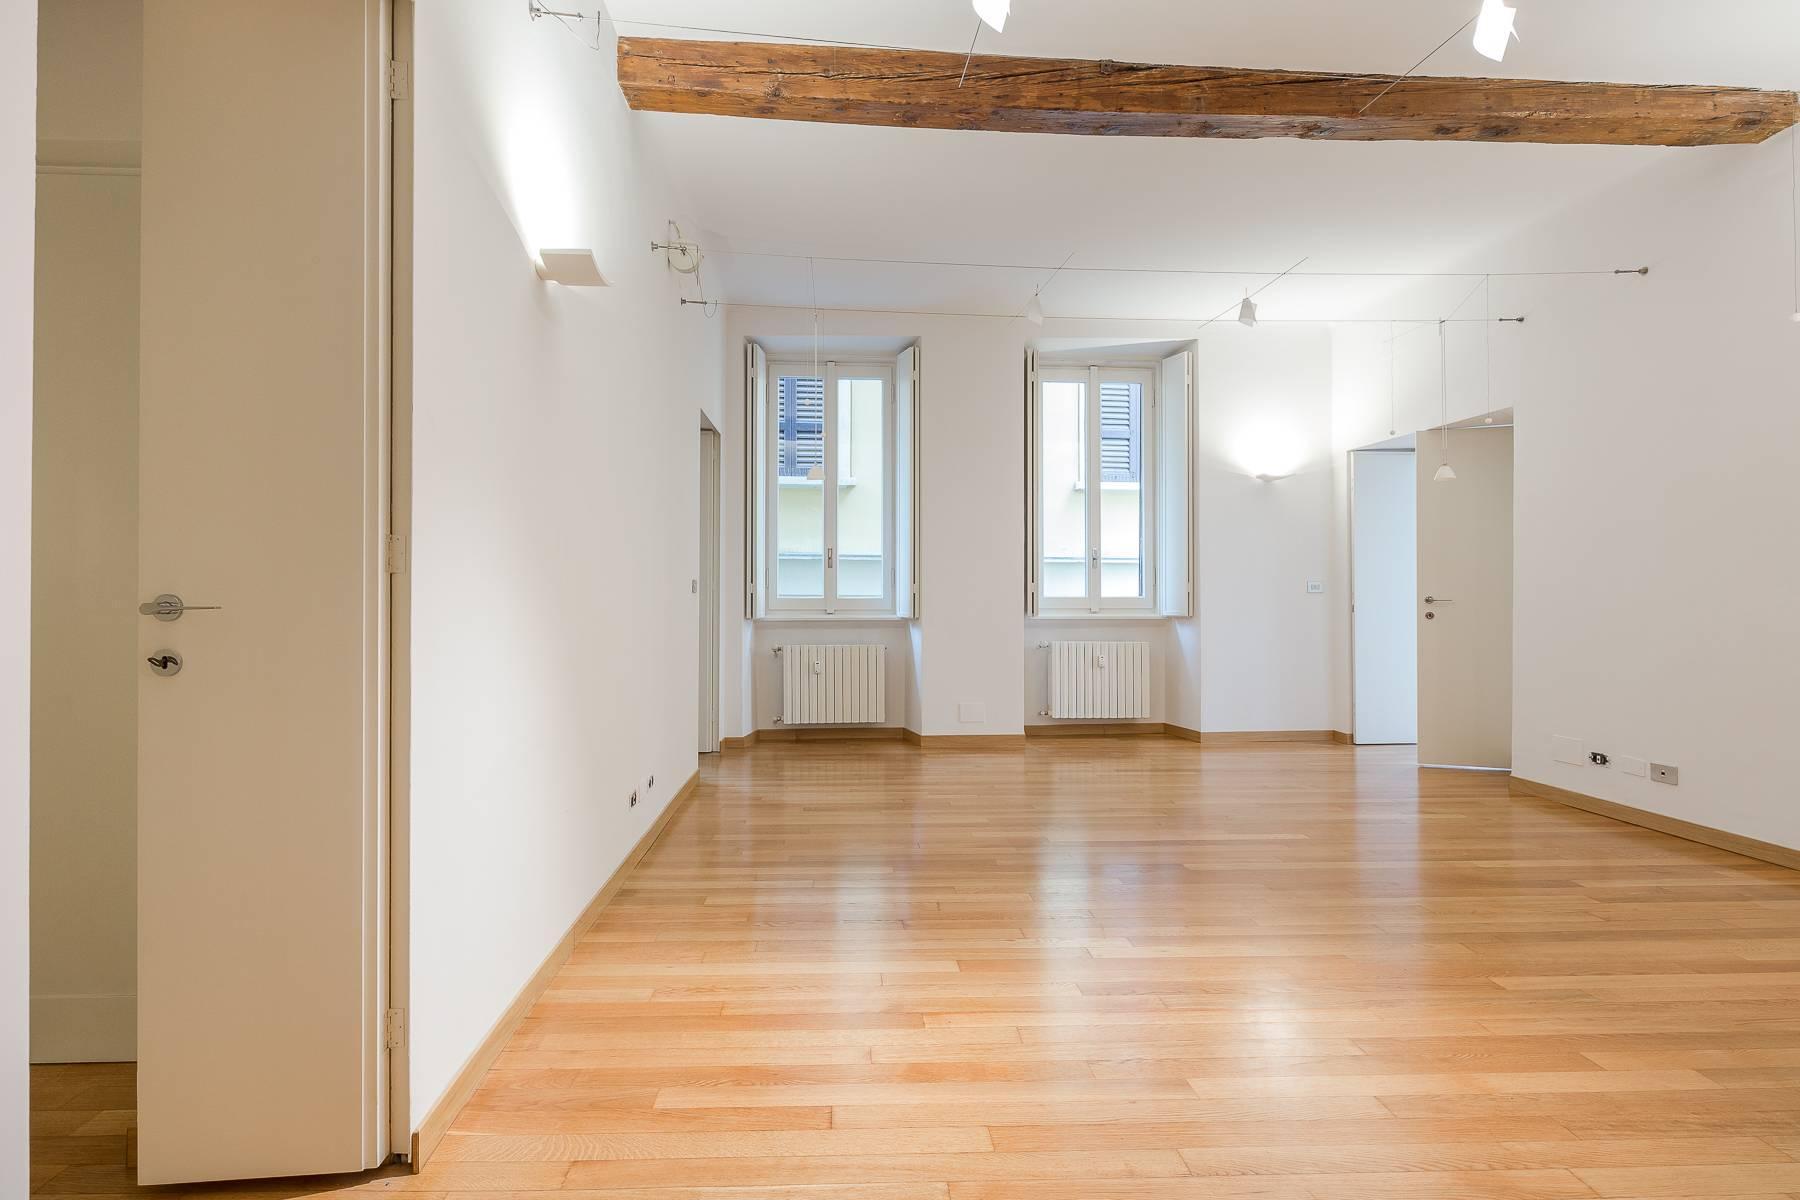 Apartment in an elegant period building located in a prestigious city district - 12